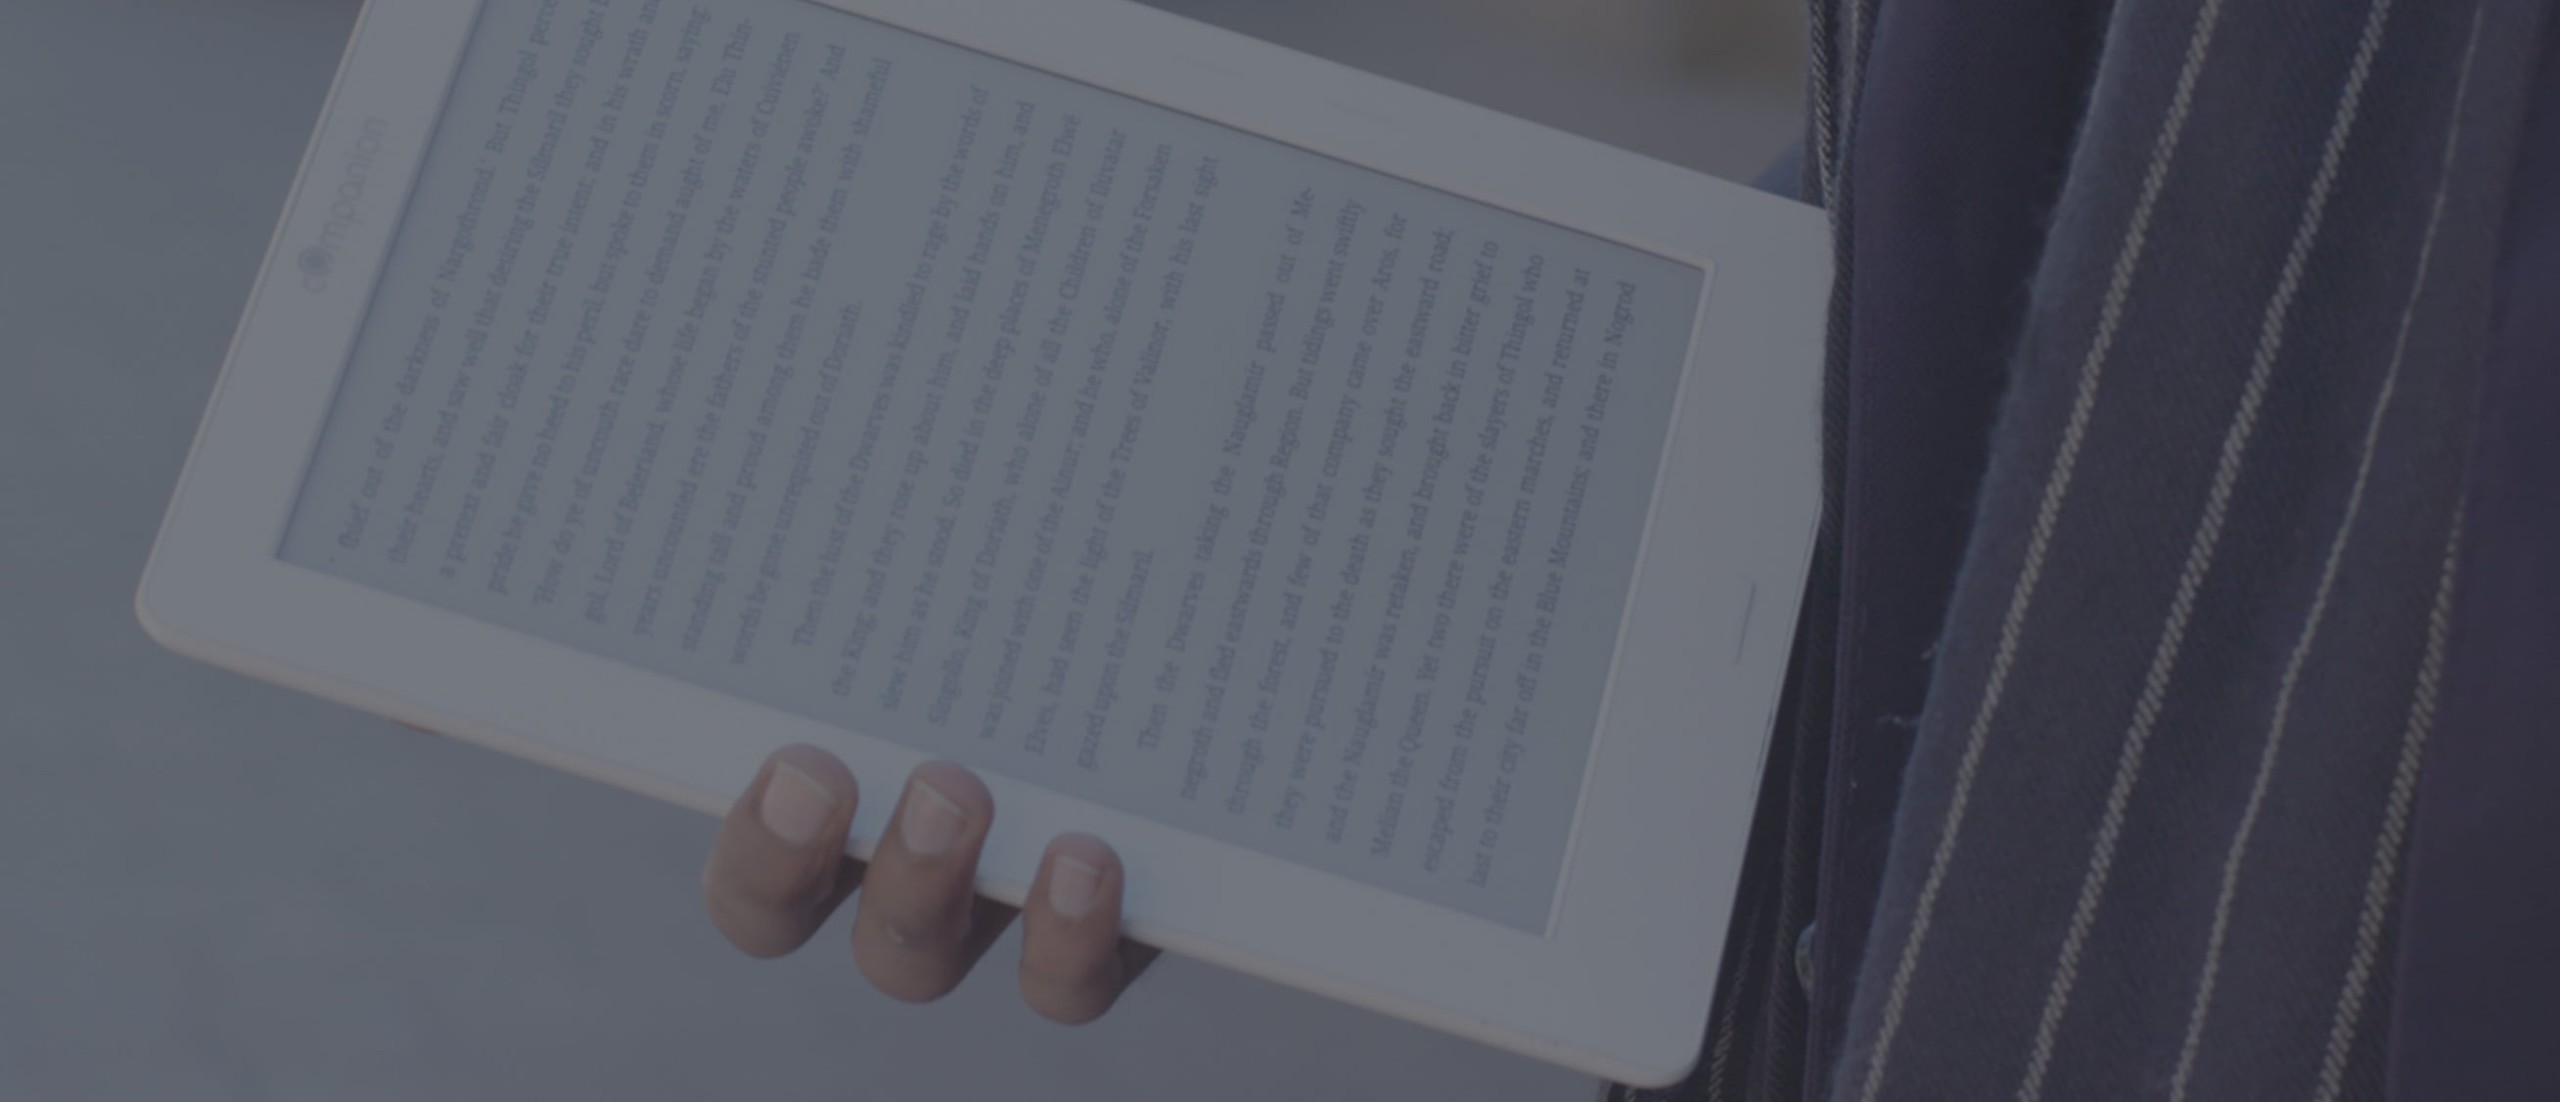 nextPaper Digital Paper Tablet